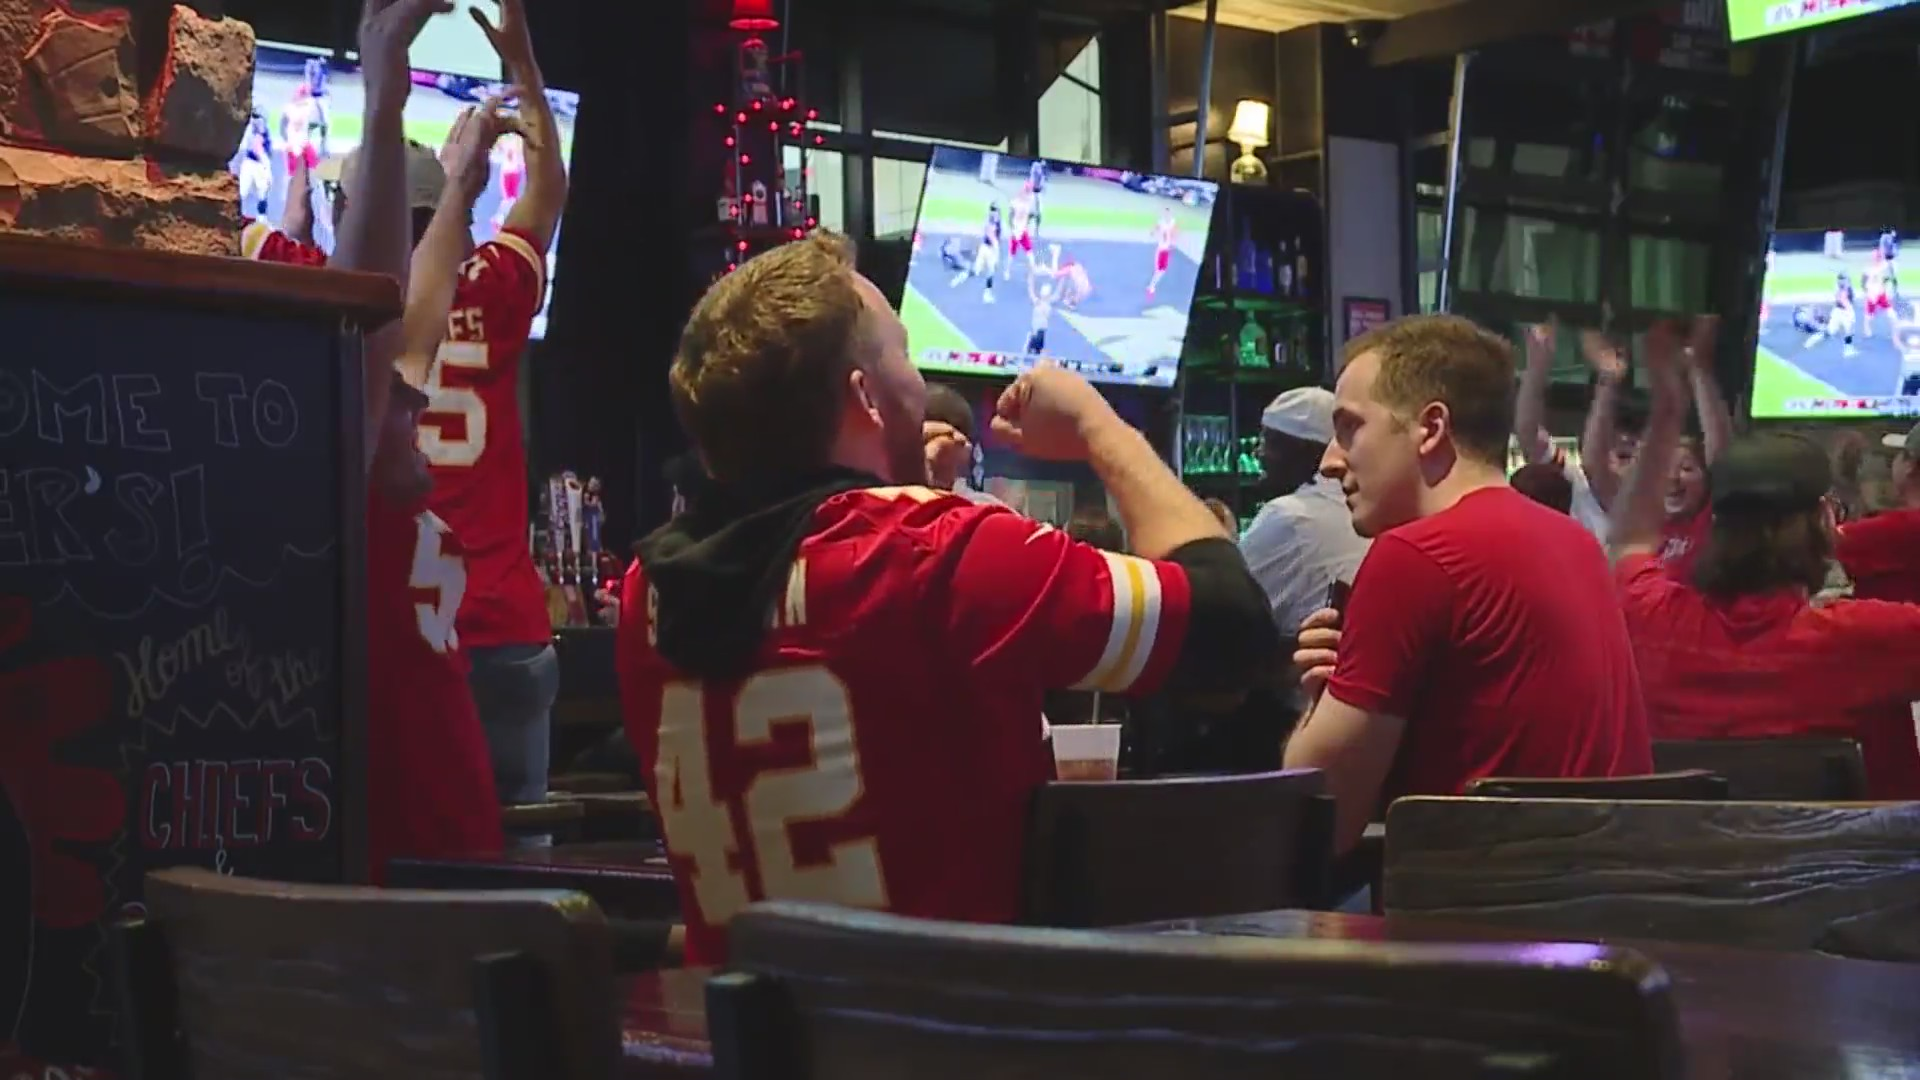 Chiefs fans cheer